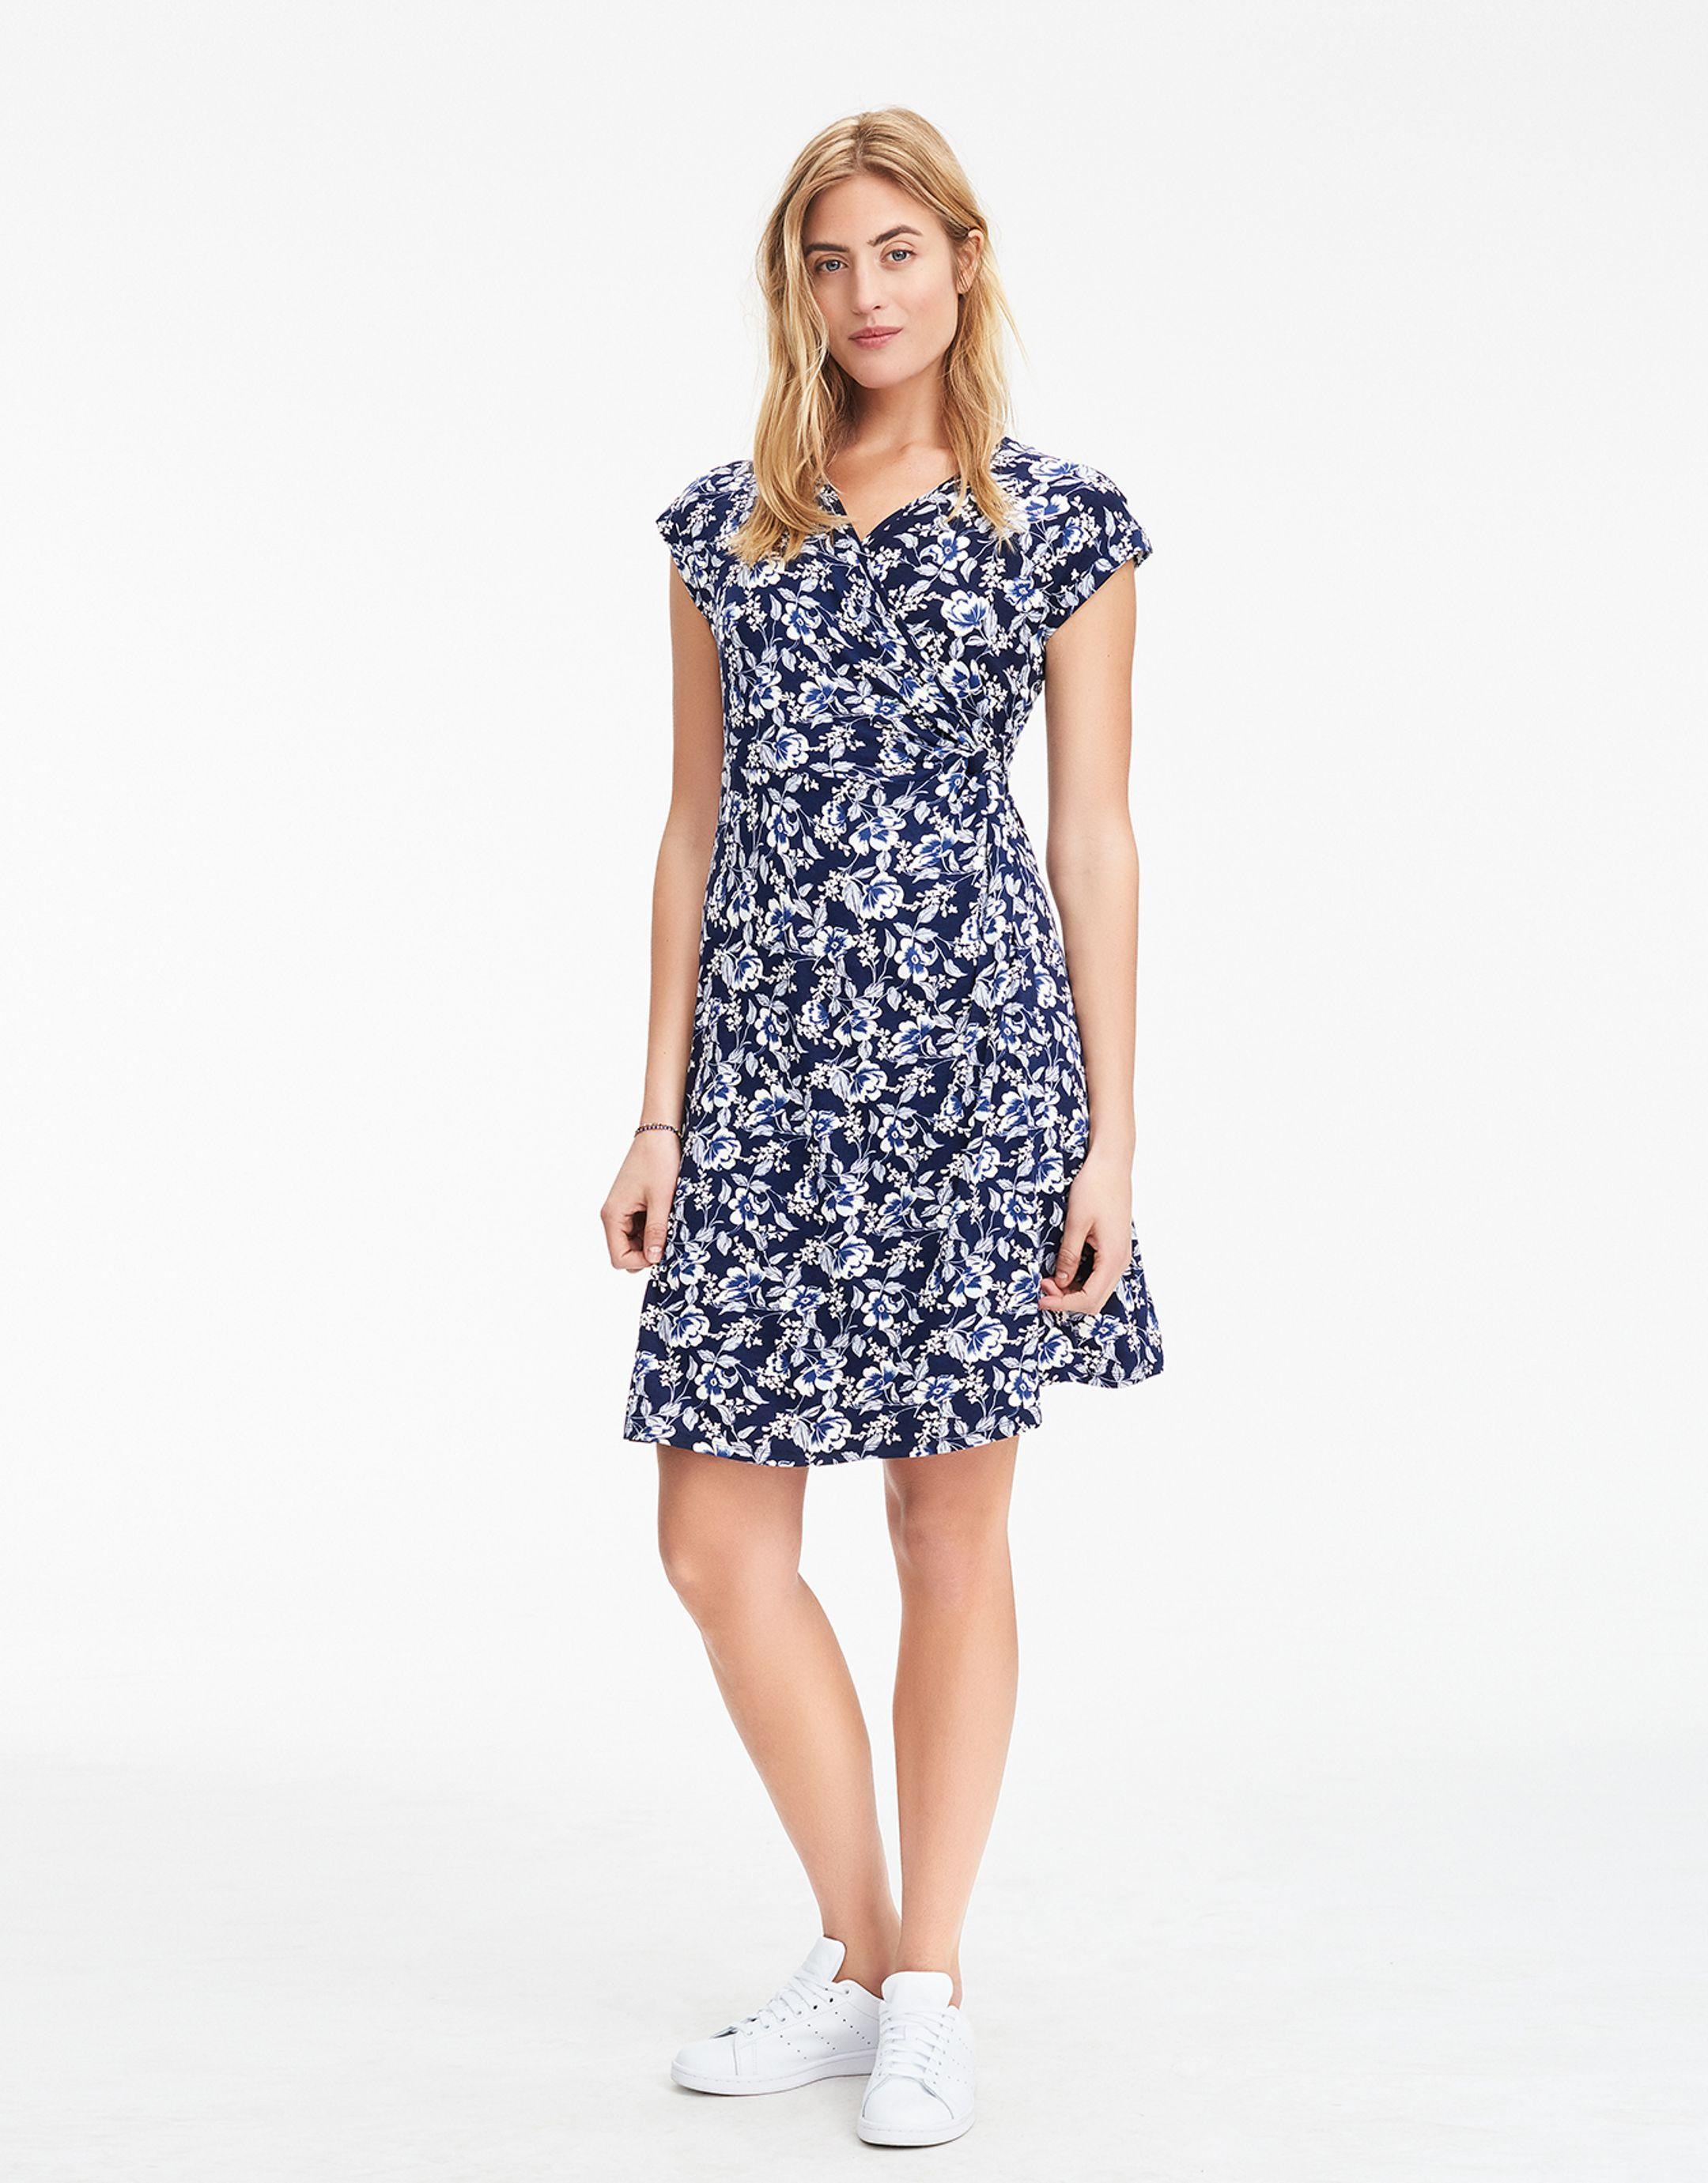 7e3b982ed929 FERN klänning marinblå | Print | Jersey dress | Klanningar | Mode |  Indiska.com